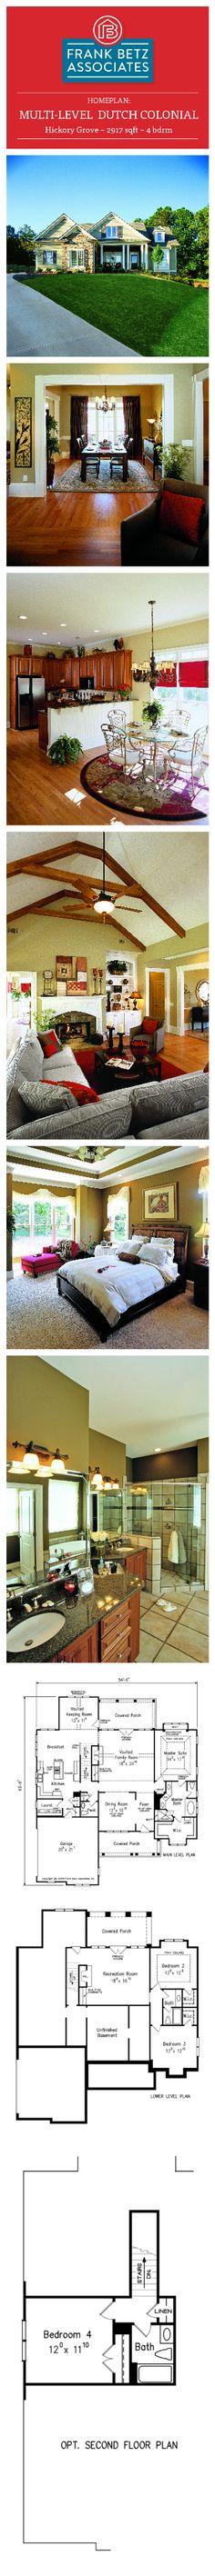 Hickory Grove: 2917 sqft, 4 bdrm, multi-level Dutch Colonial house plan design by Frank Betz Associates Inc.